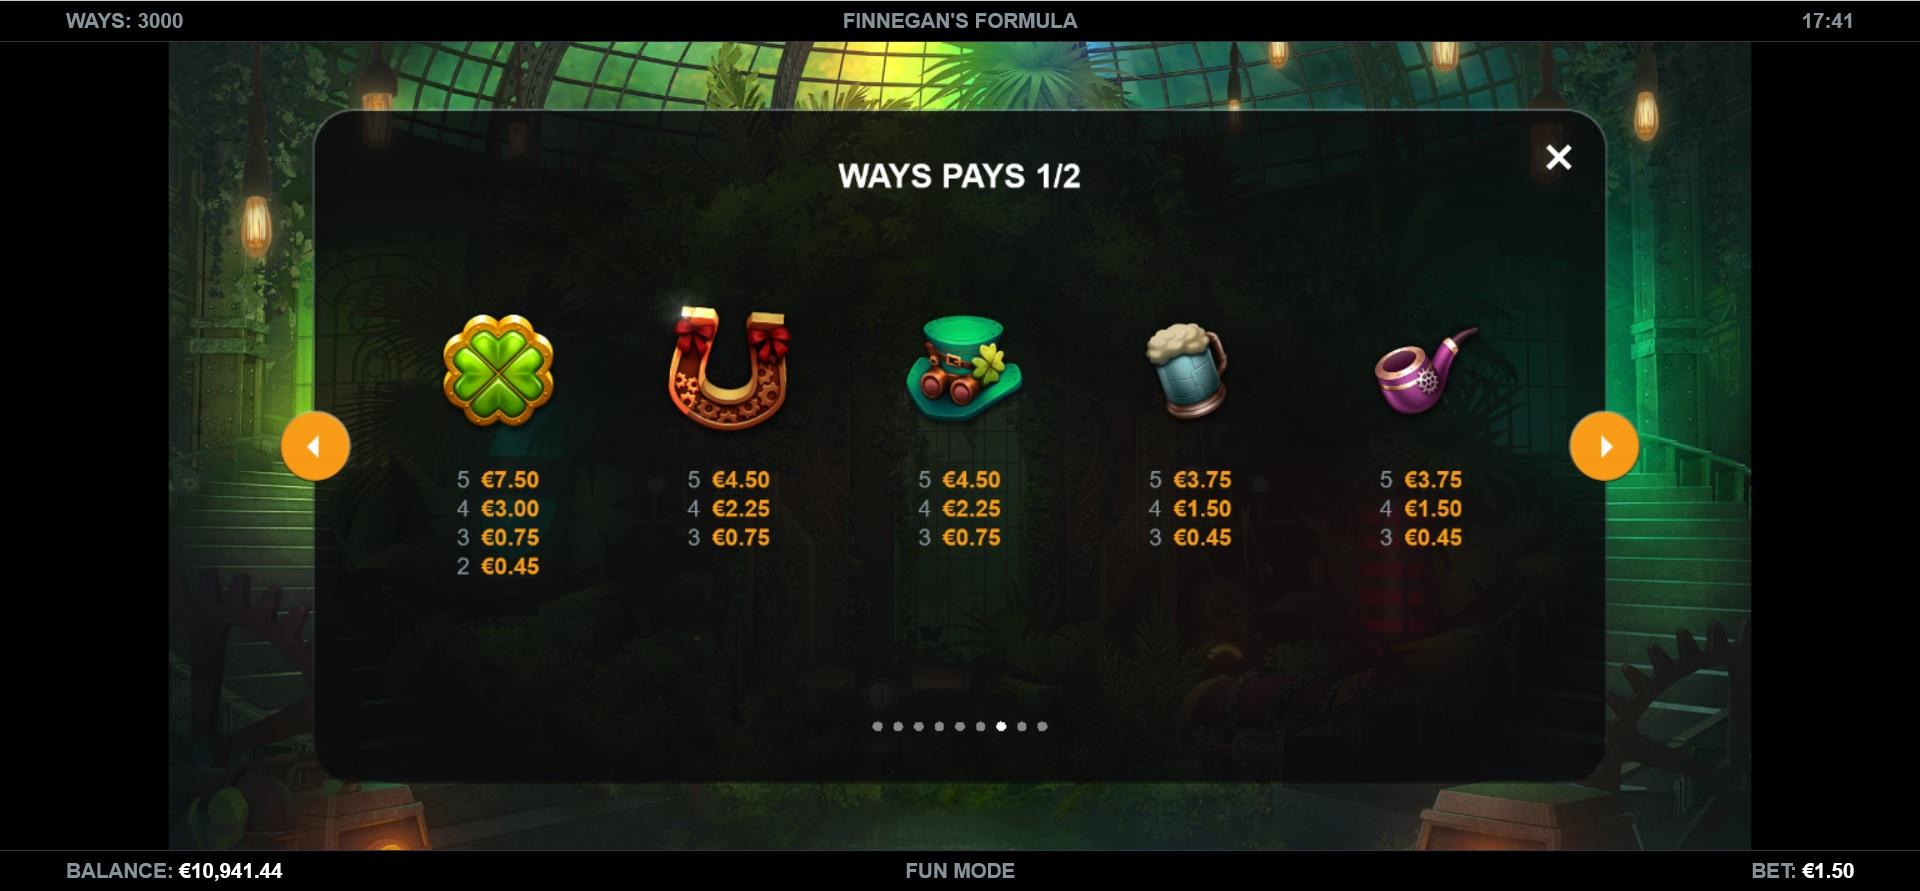 Finnegan's Formula Paytable